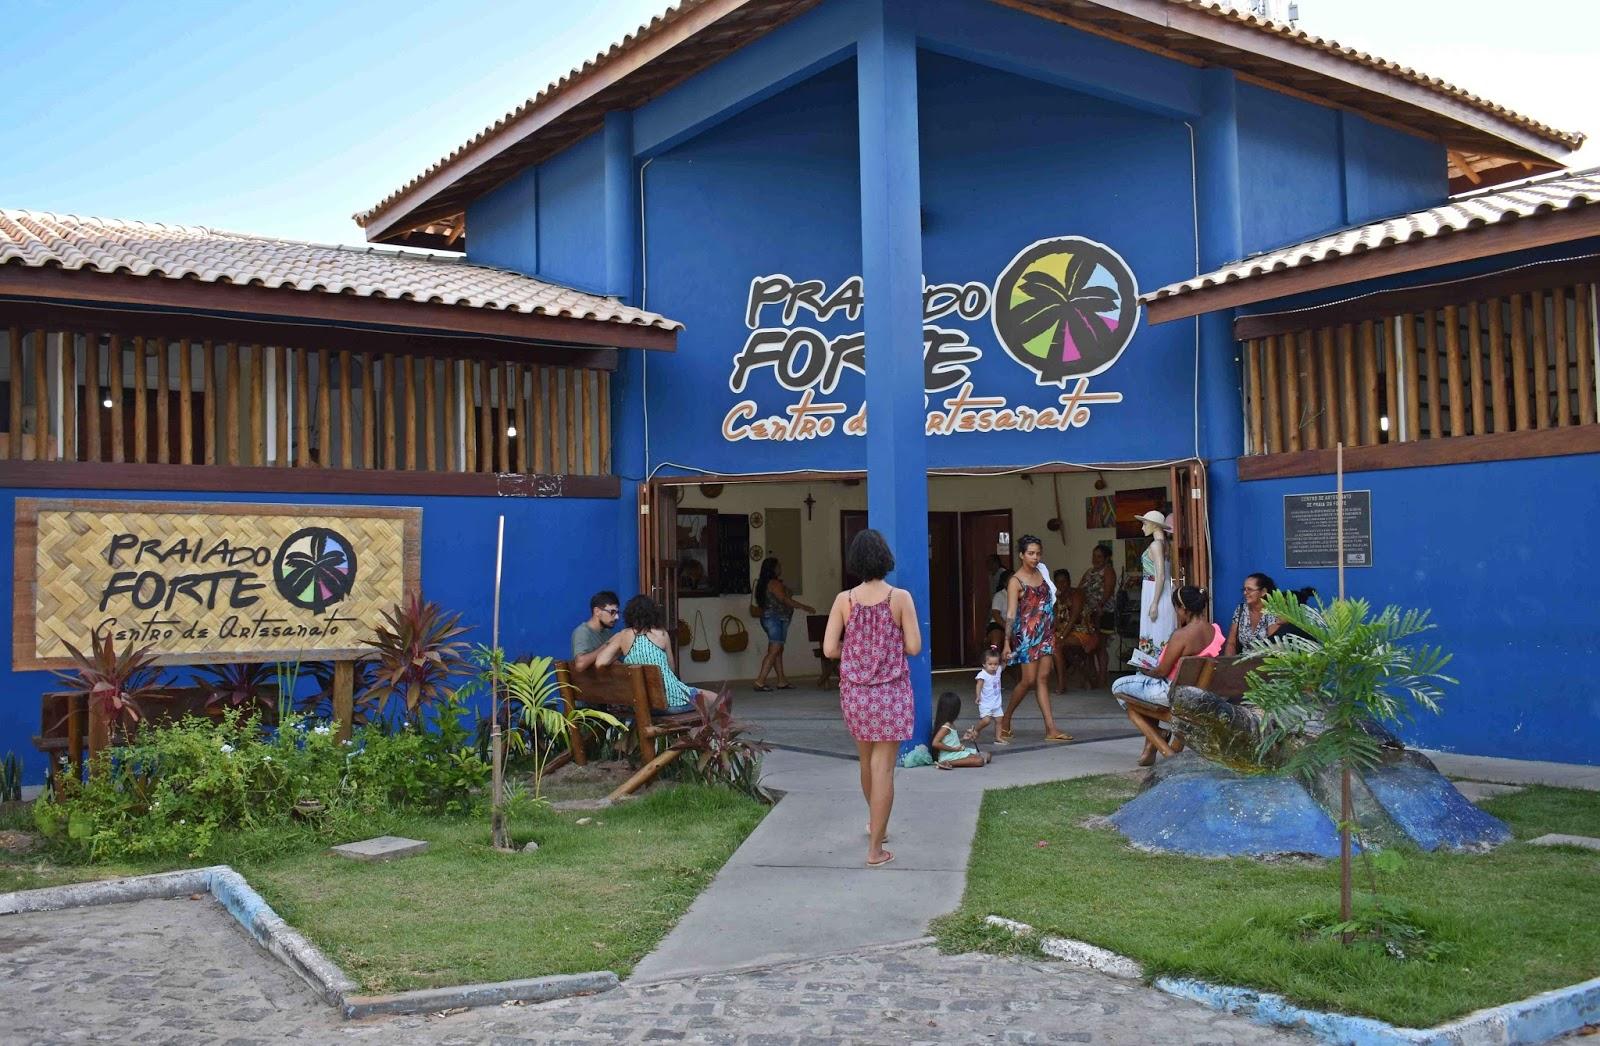 Centro de Artesanato da Praia do Forte